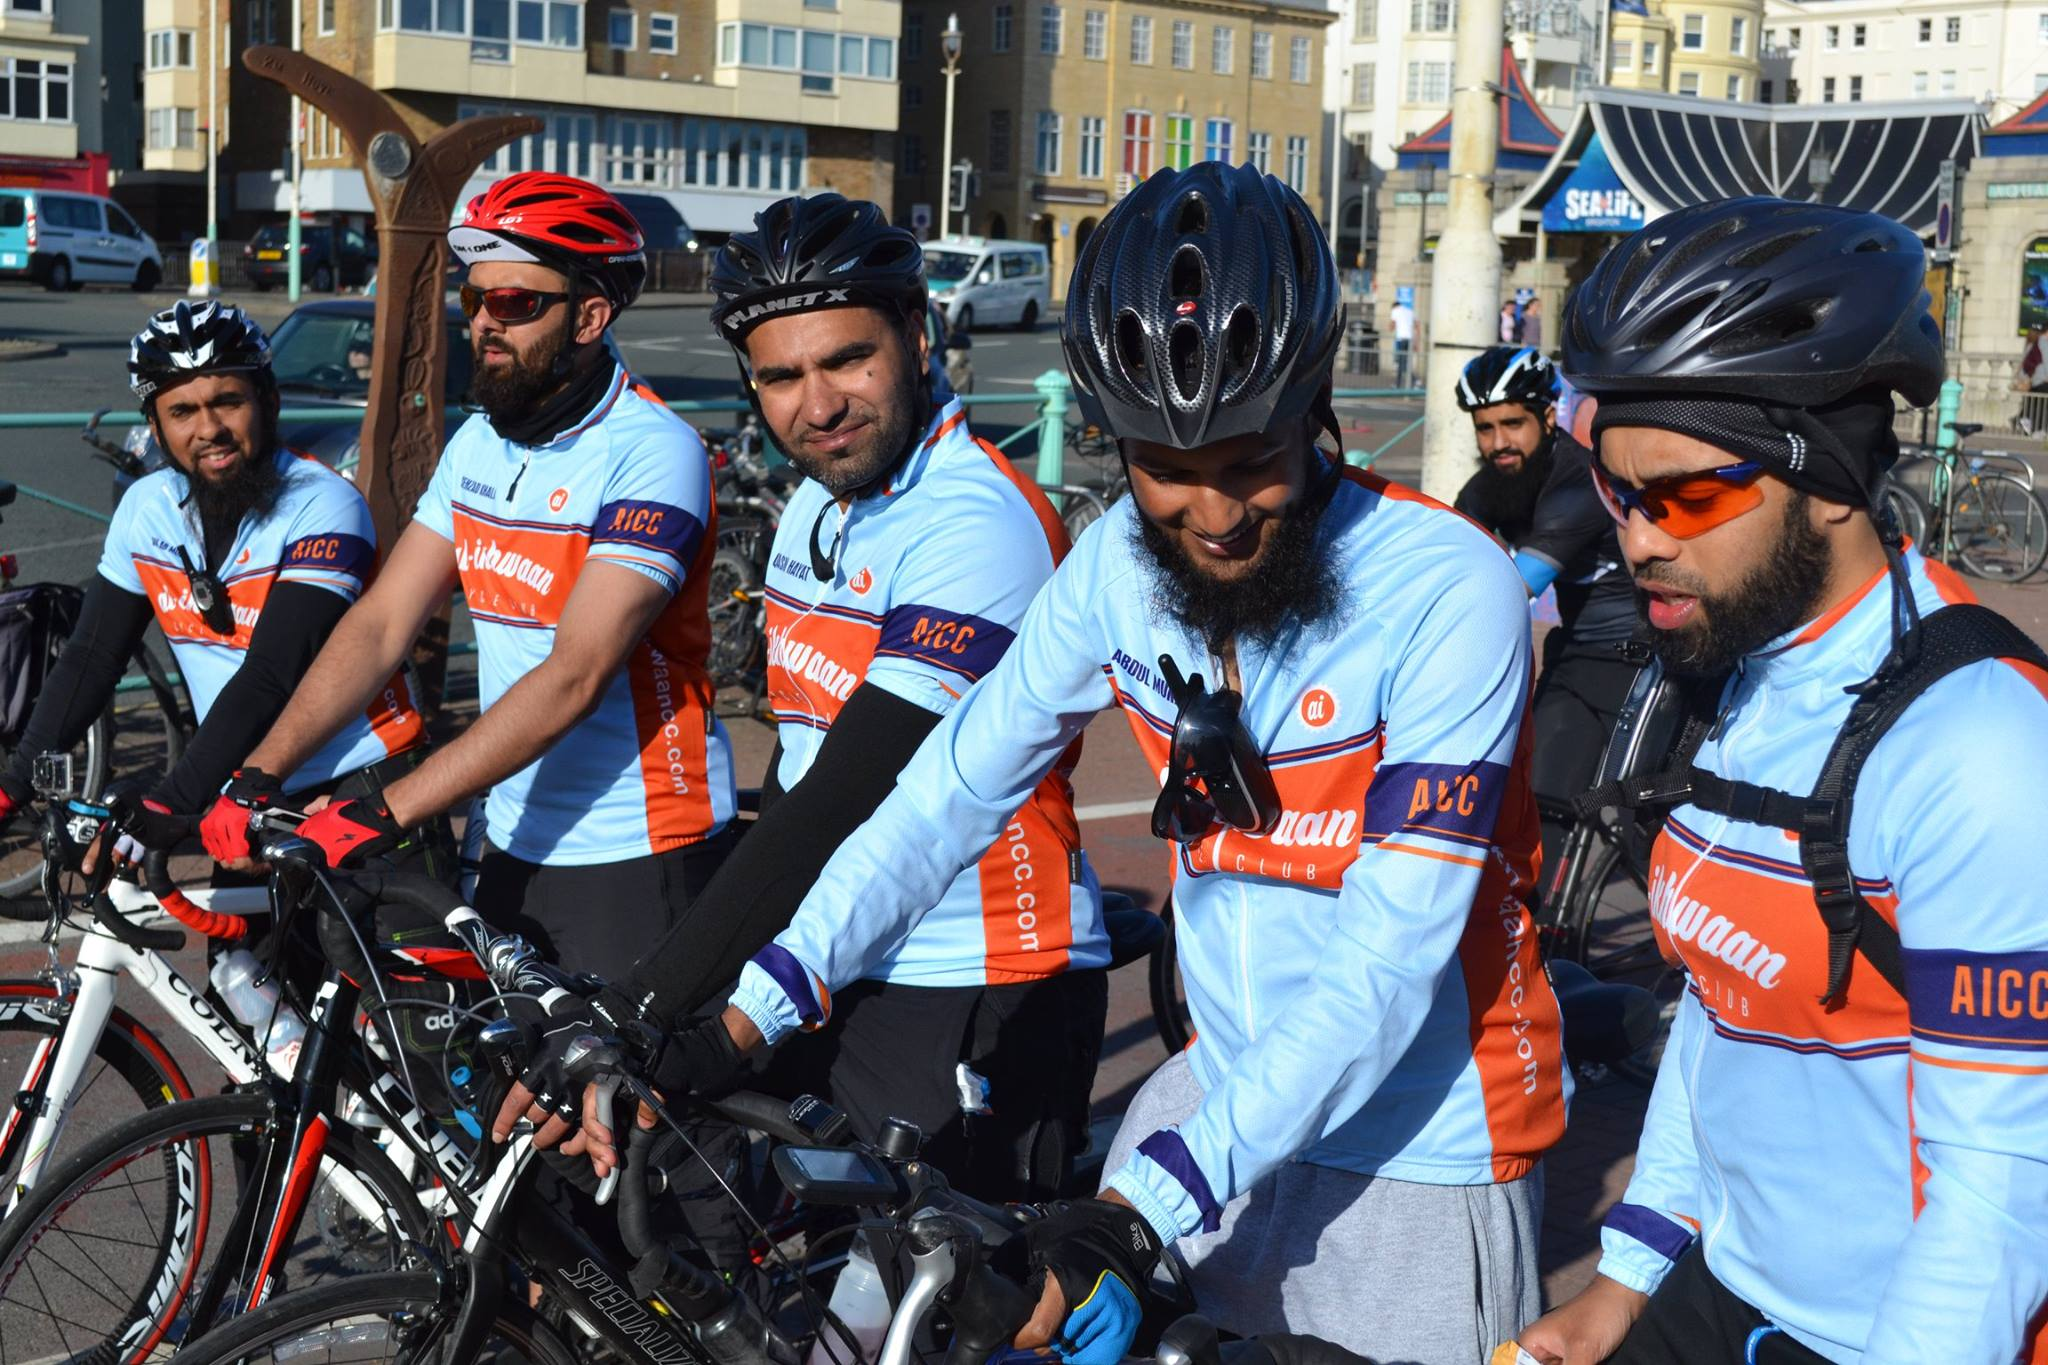 London to brighton Charity Cycle Ride   Muslim Cyclists   AICC